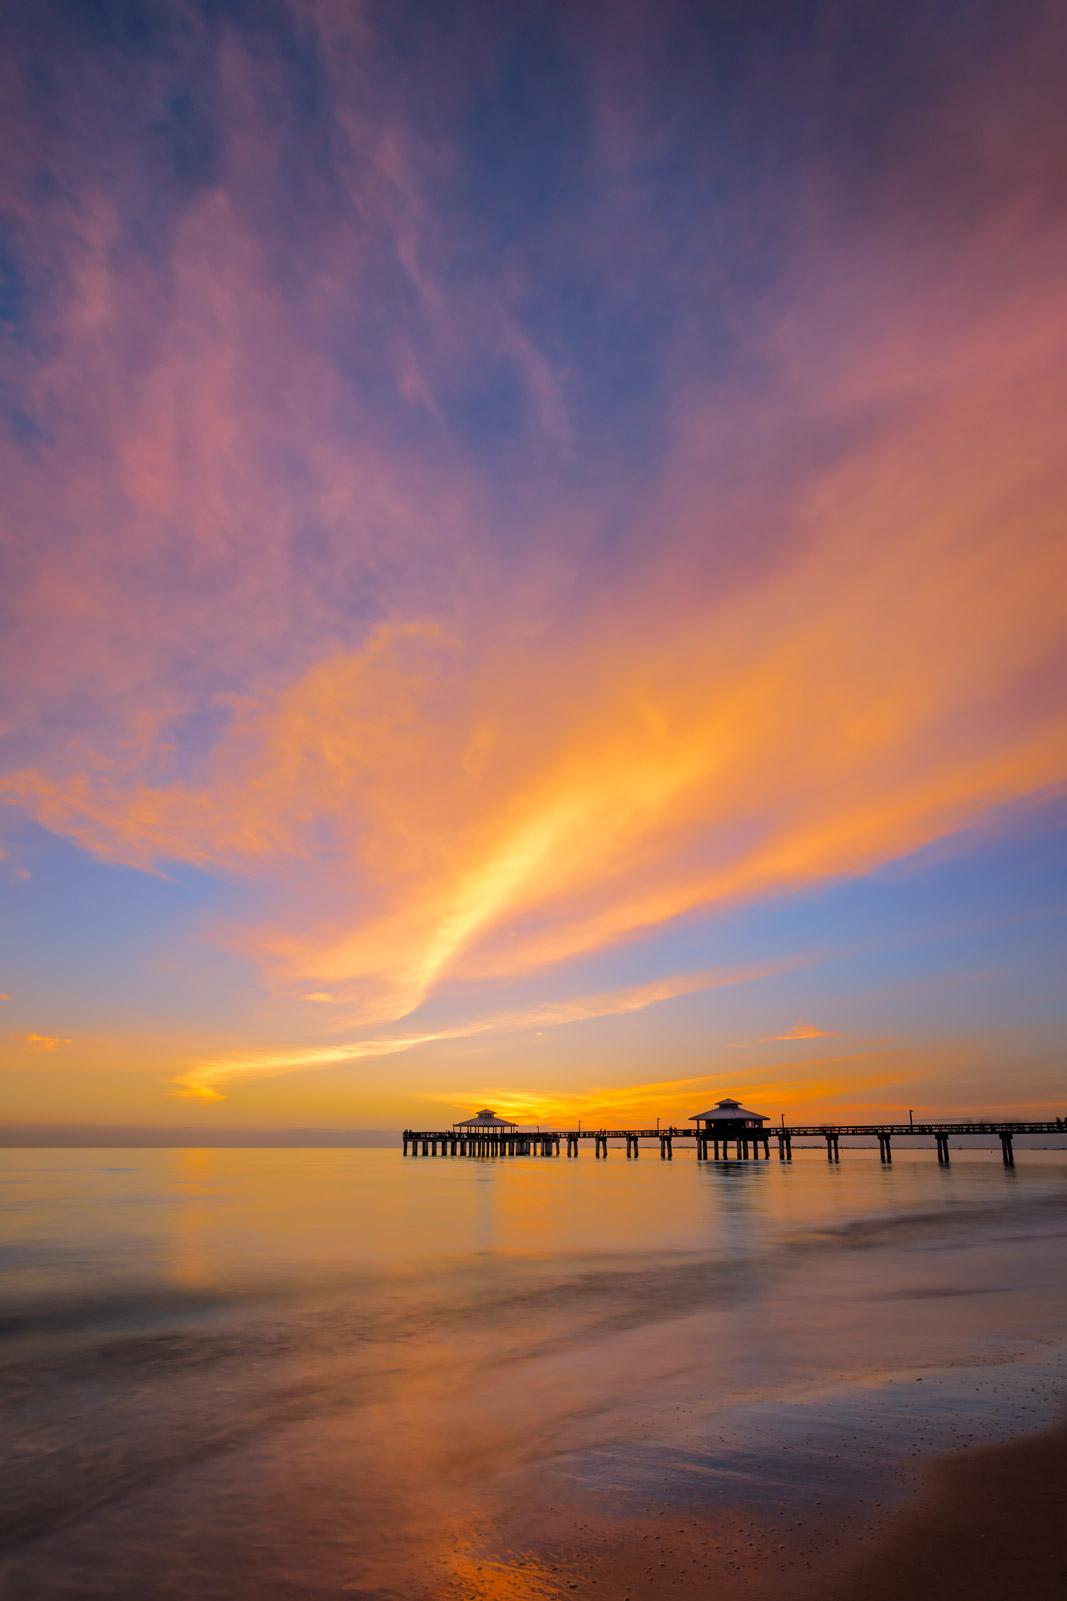 Florida, Fort Meyers, Beach, Pier, sunset, limited edition, photograph, fine art, landscape, gulf coast, photo